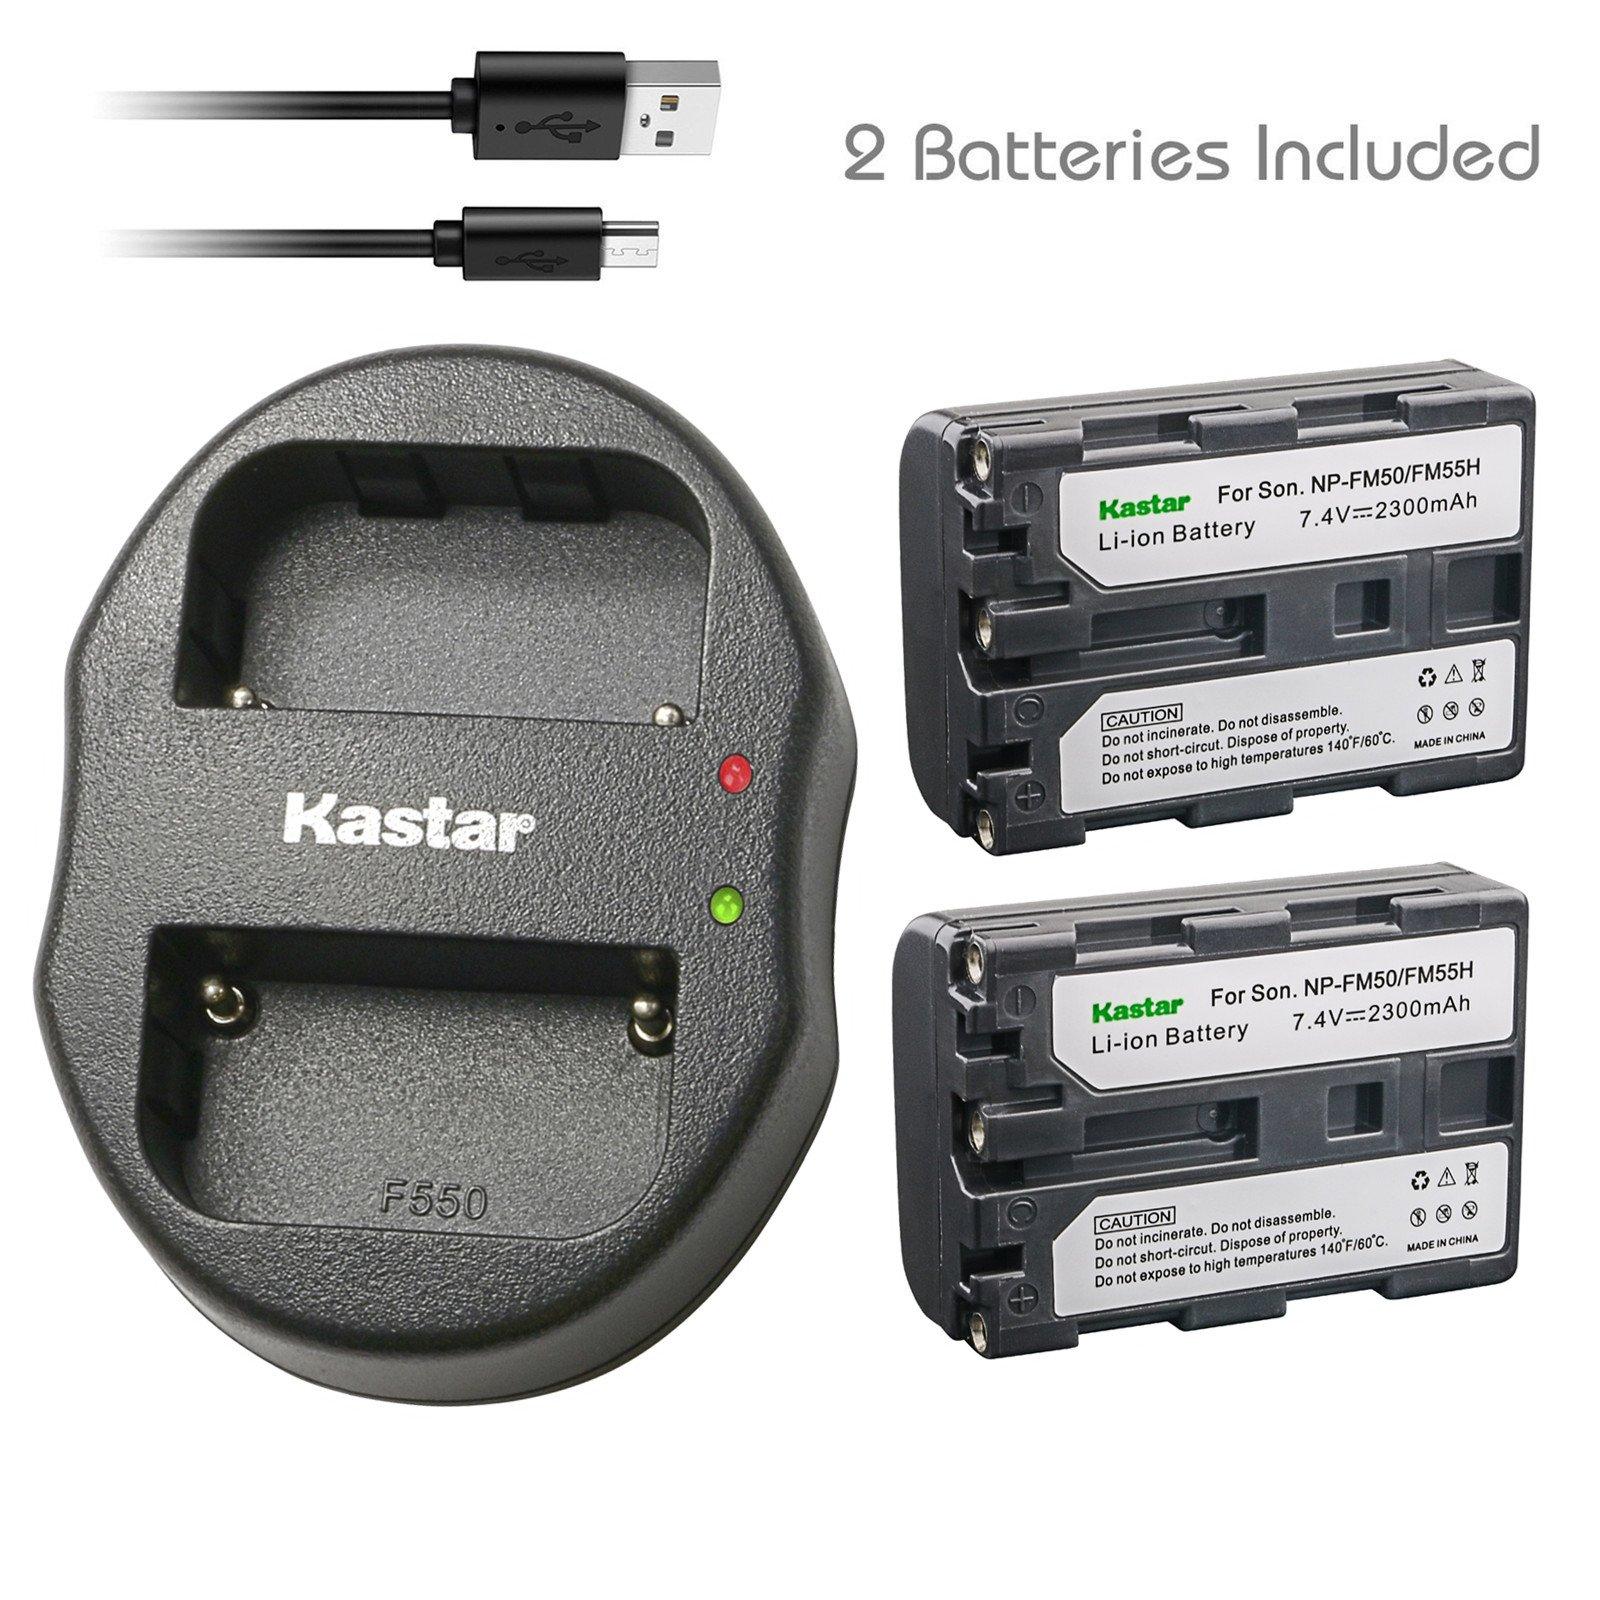 Kastar Battery (X2) & Dual USB Charger for NP-FM50 NP-FM30 NP-FM51 NP-QM50 NP-QM51 NP-FM55H and Sony CCD-FRV DCR-PC DCR-TRV DCR-DVD DSR-PDX GV HVL Series Camera Camcorder